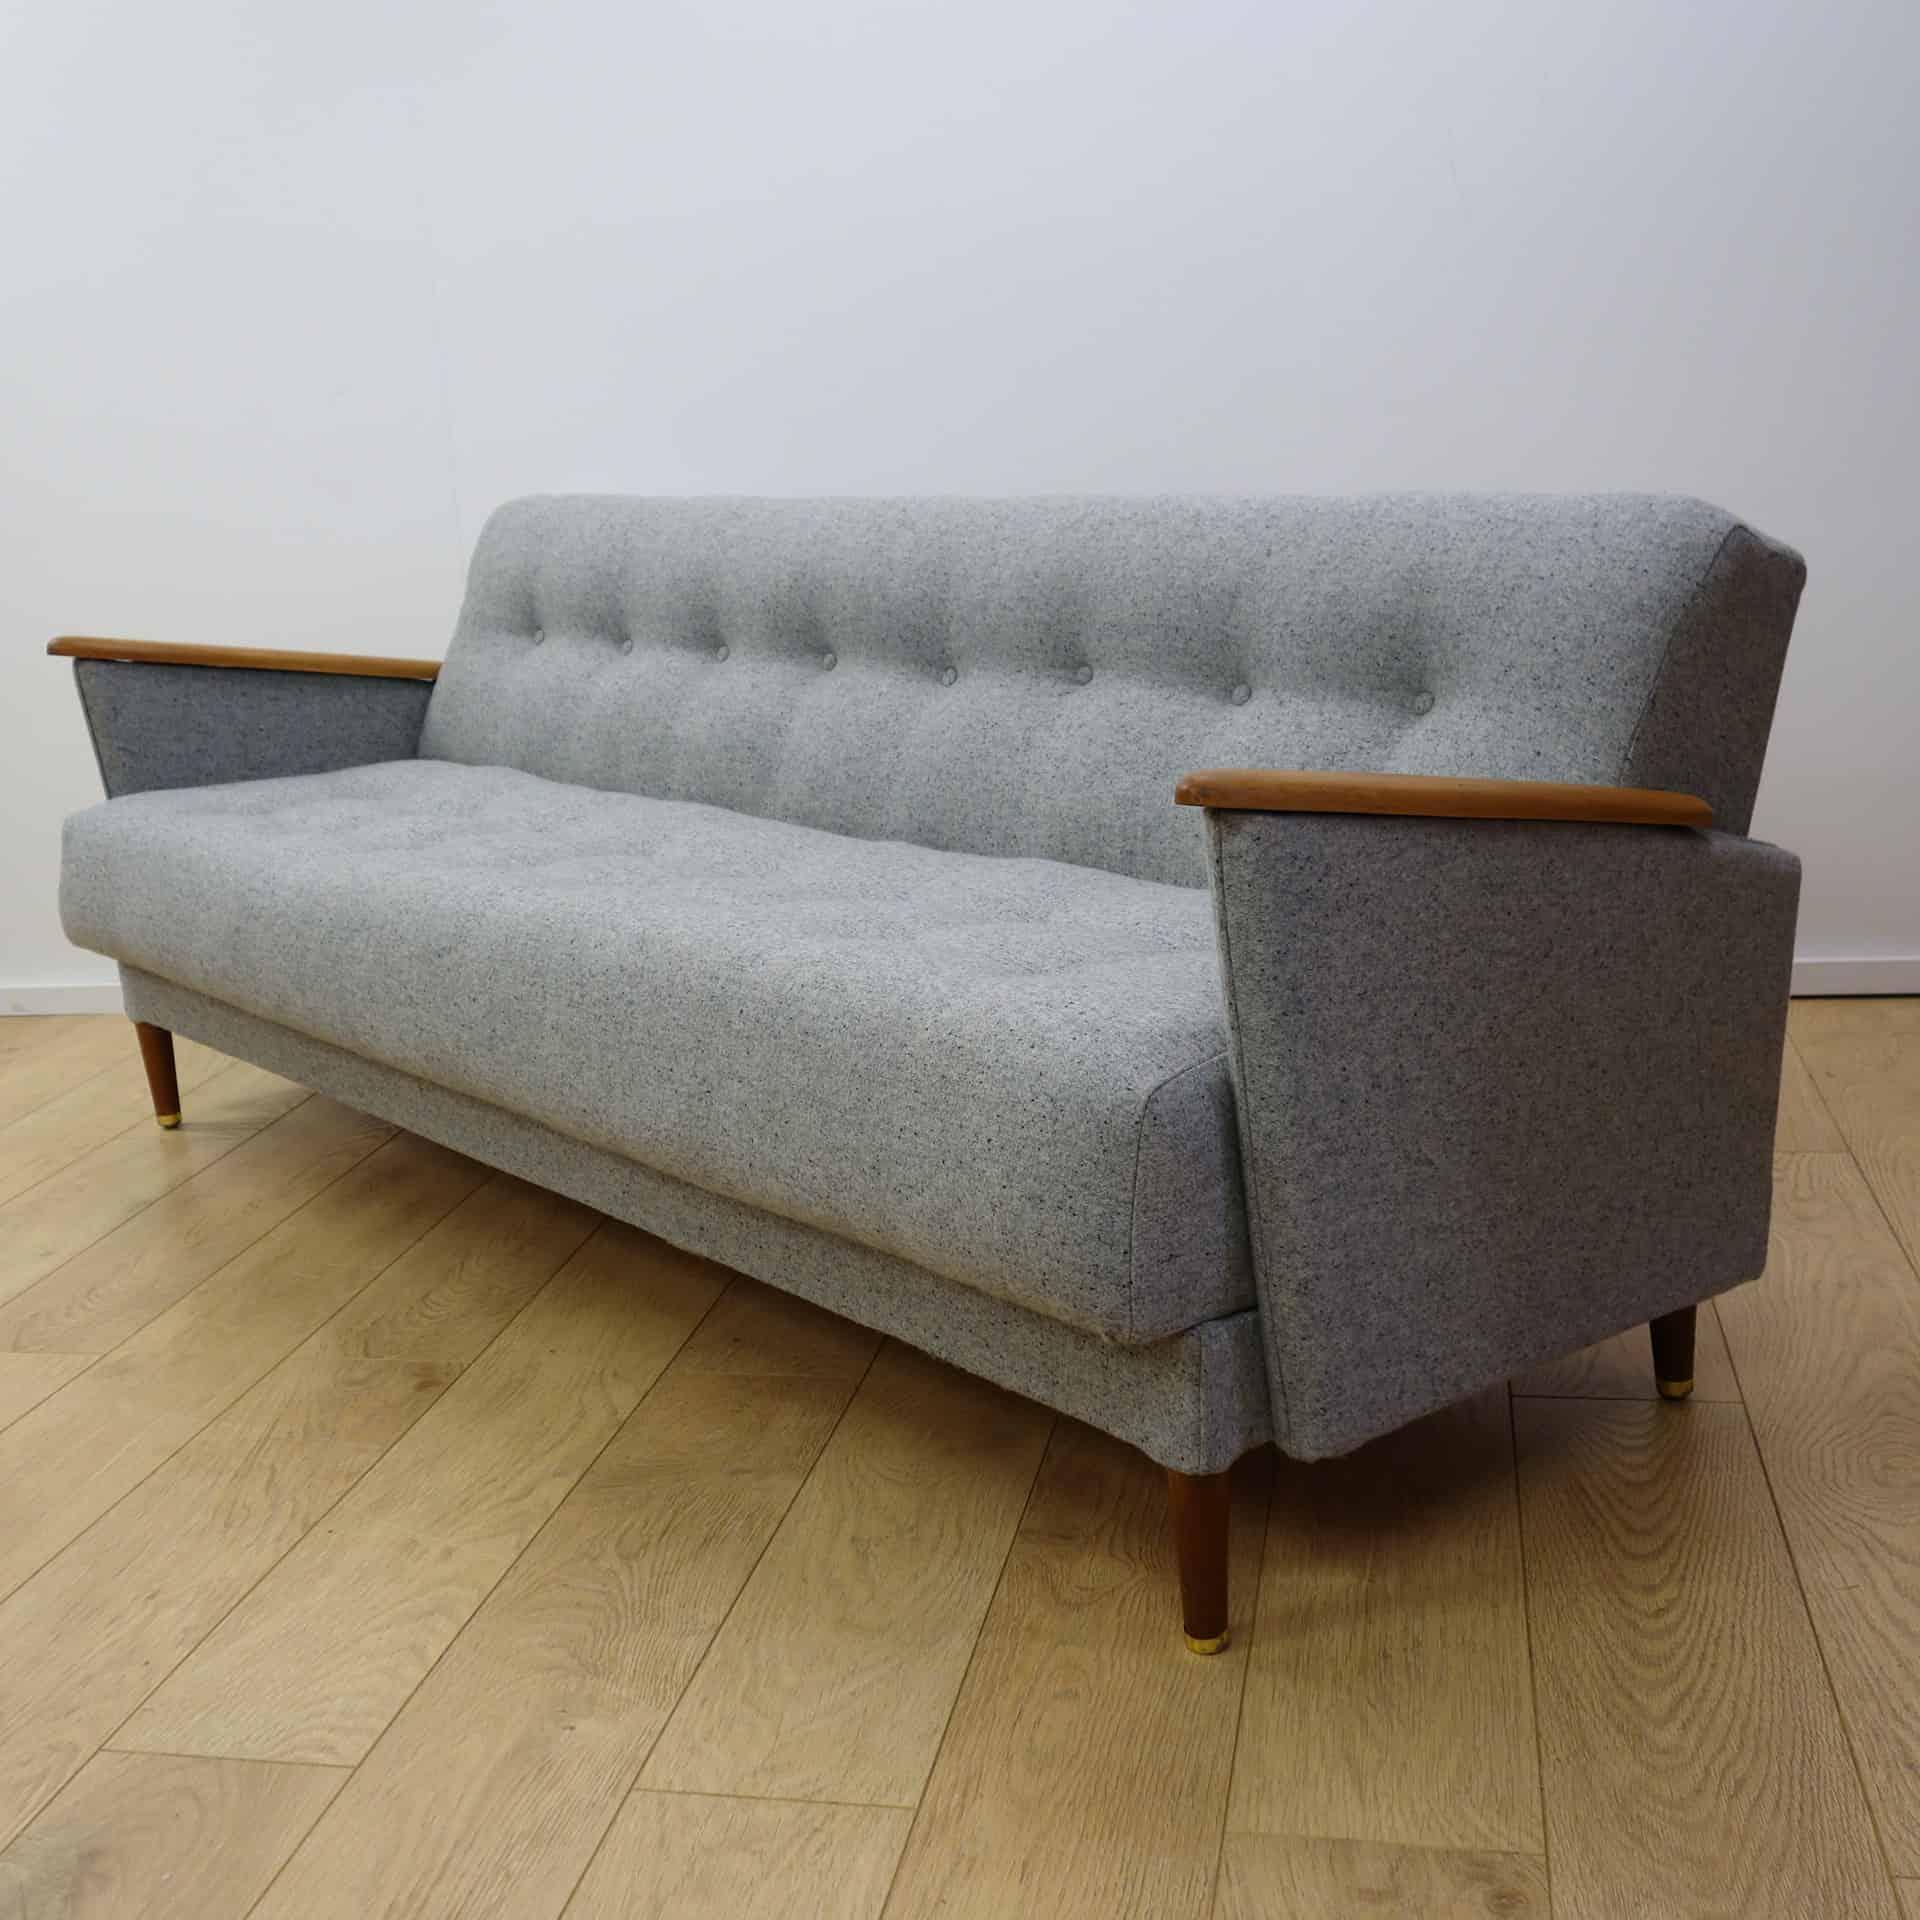 A Mid Century Light Grey Sofa Bed - Mark Parrish Mid Century Modern